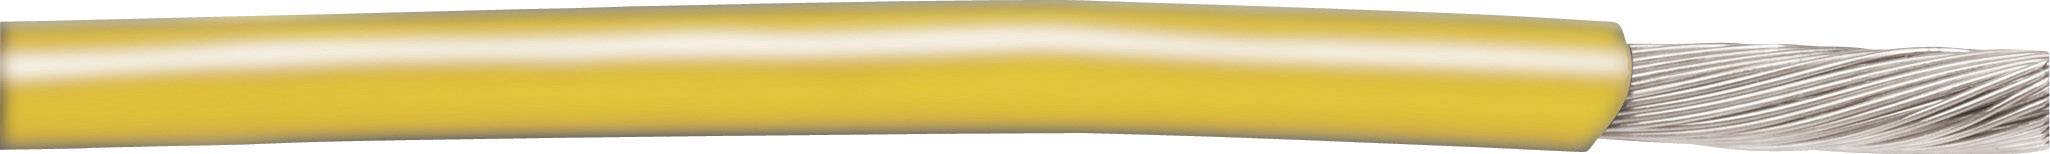 Pletenica 1 x 0.13 mm, bela AlphaWire 6821 30.5 m